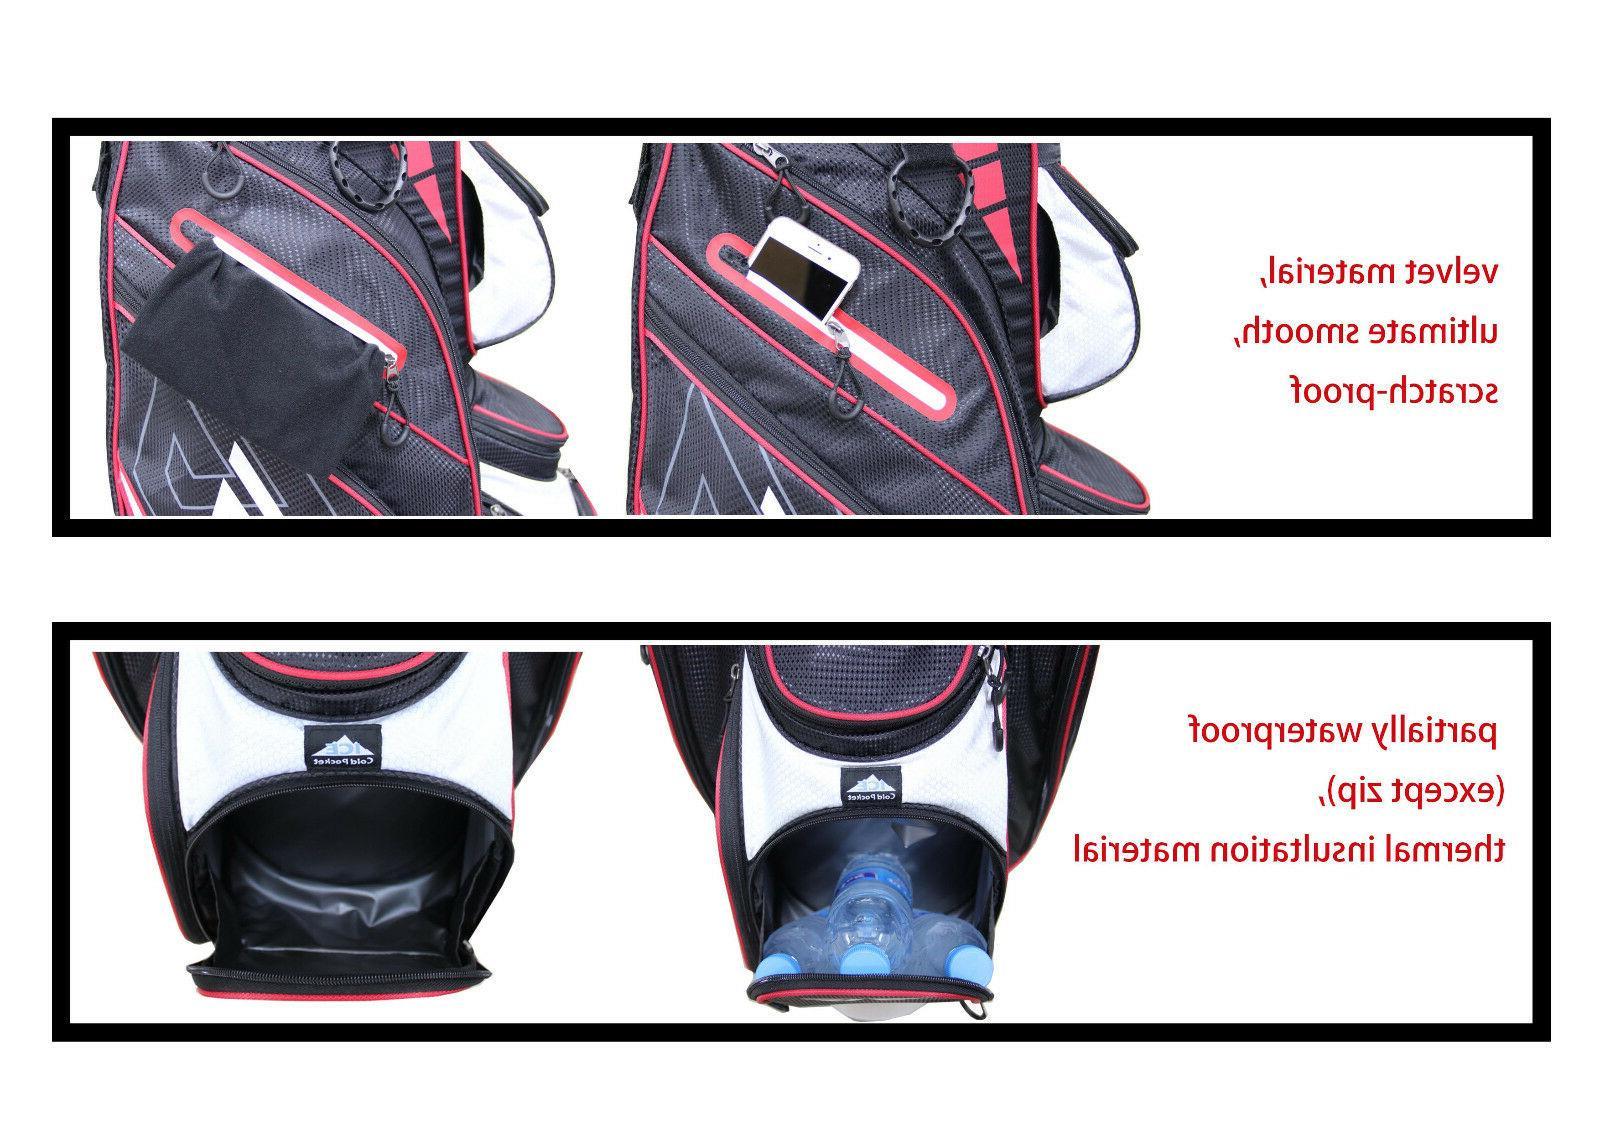 EG Eagole 14 Way Full Length Divider,10 Pockets Golf Cart Bag